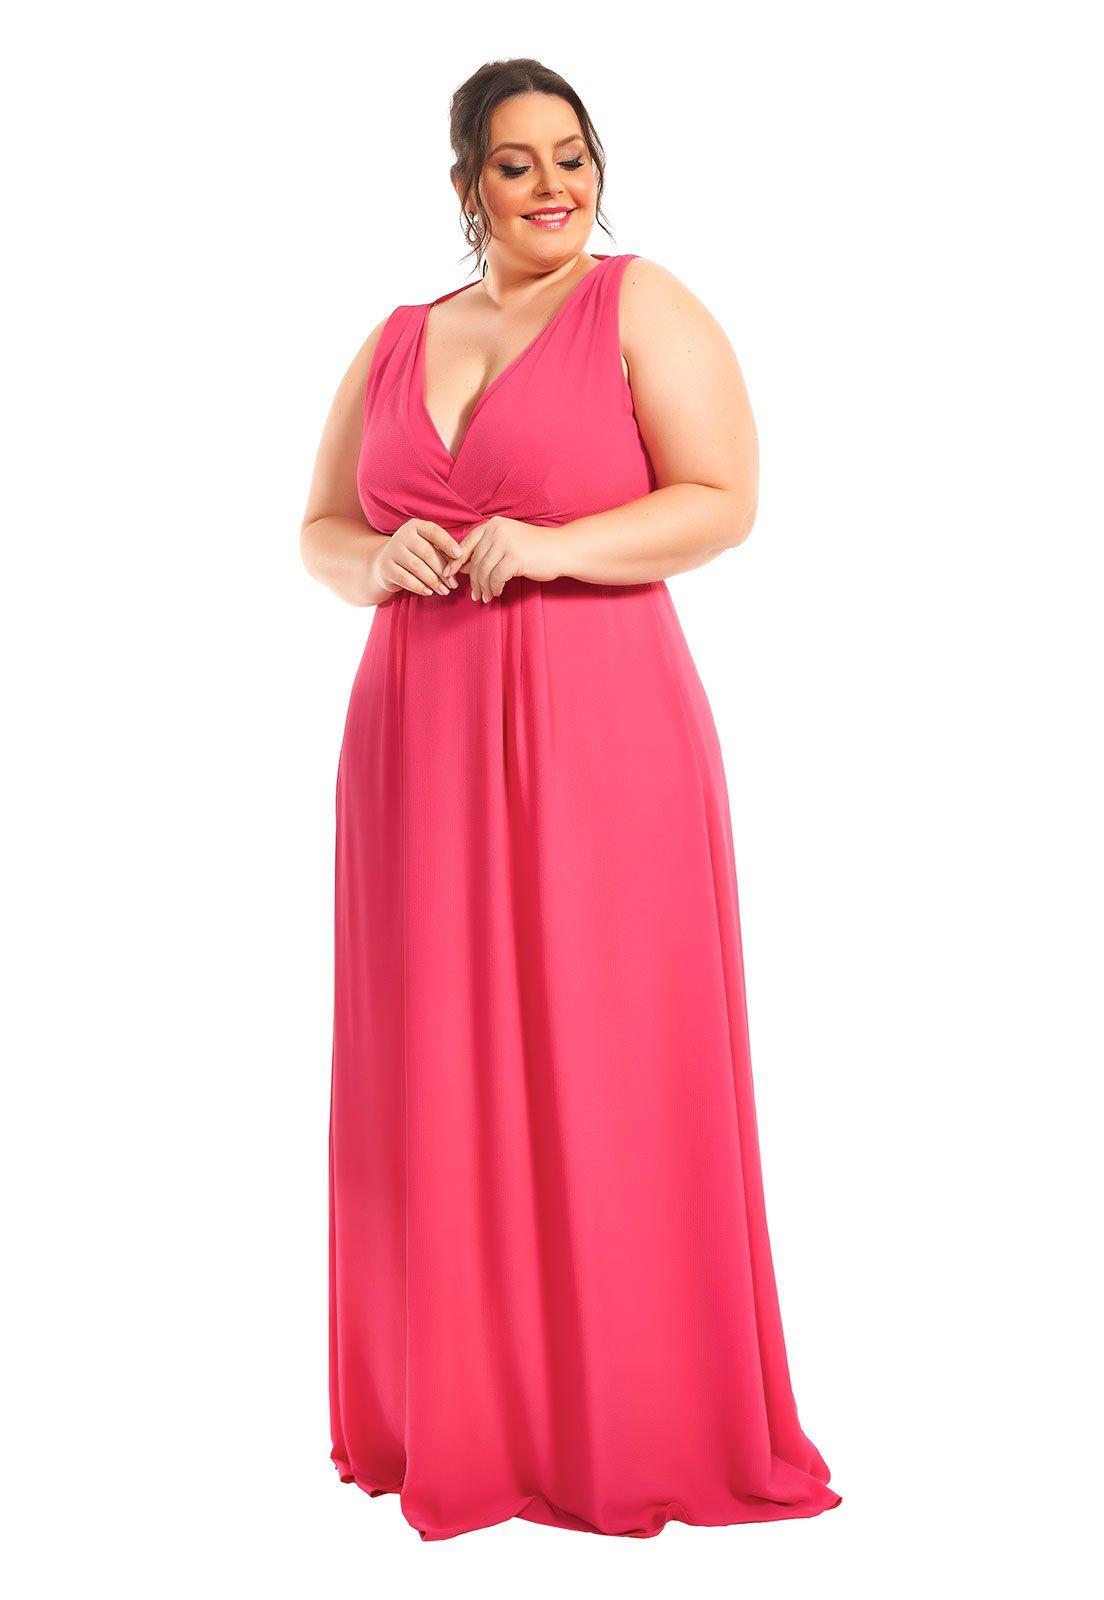 Vestido Longo Plus Size Rosa Cupido Lala Dubi